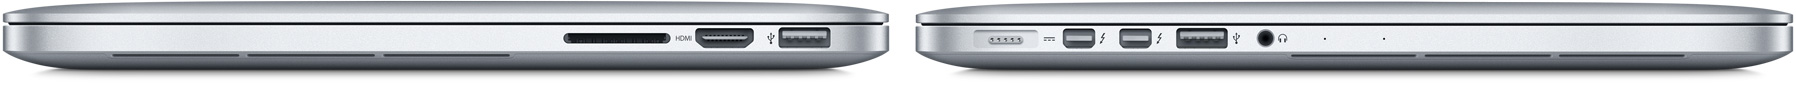 Mac Book Pro Technology - MacBook Pro